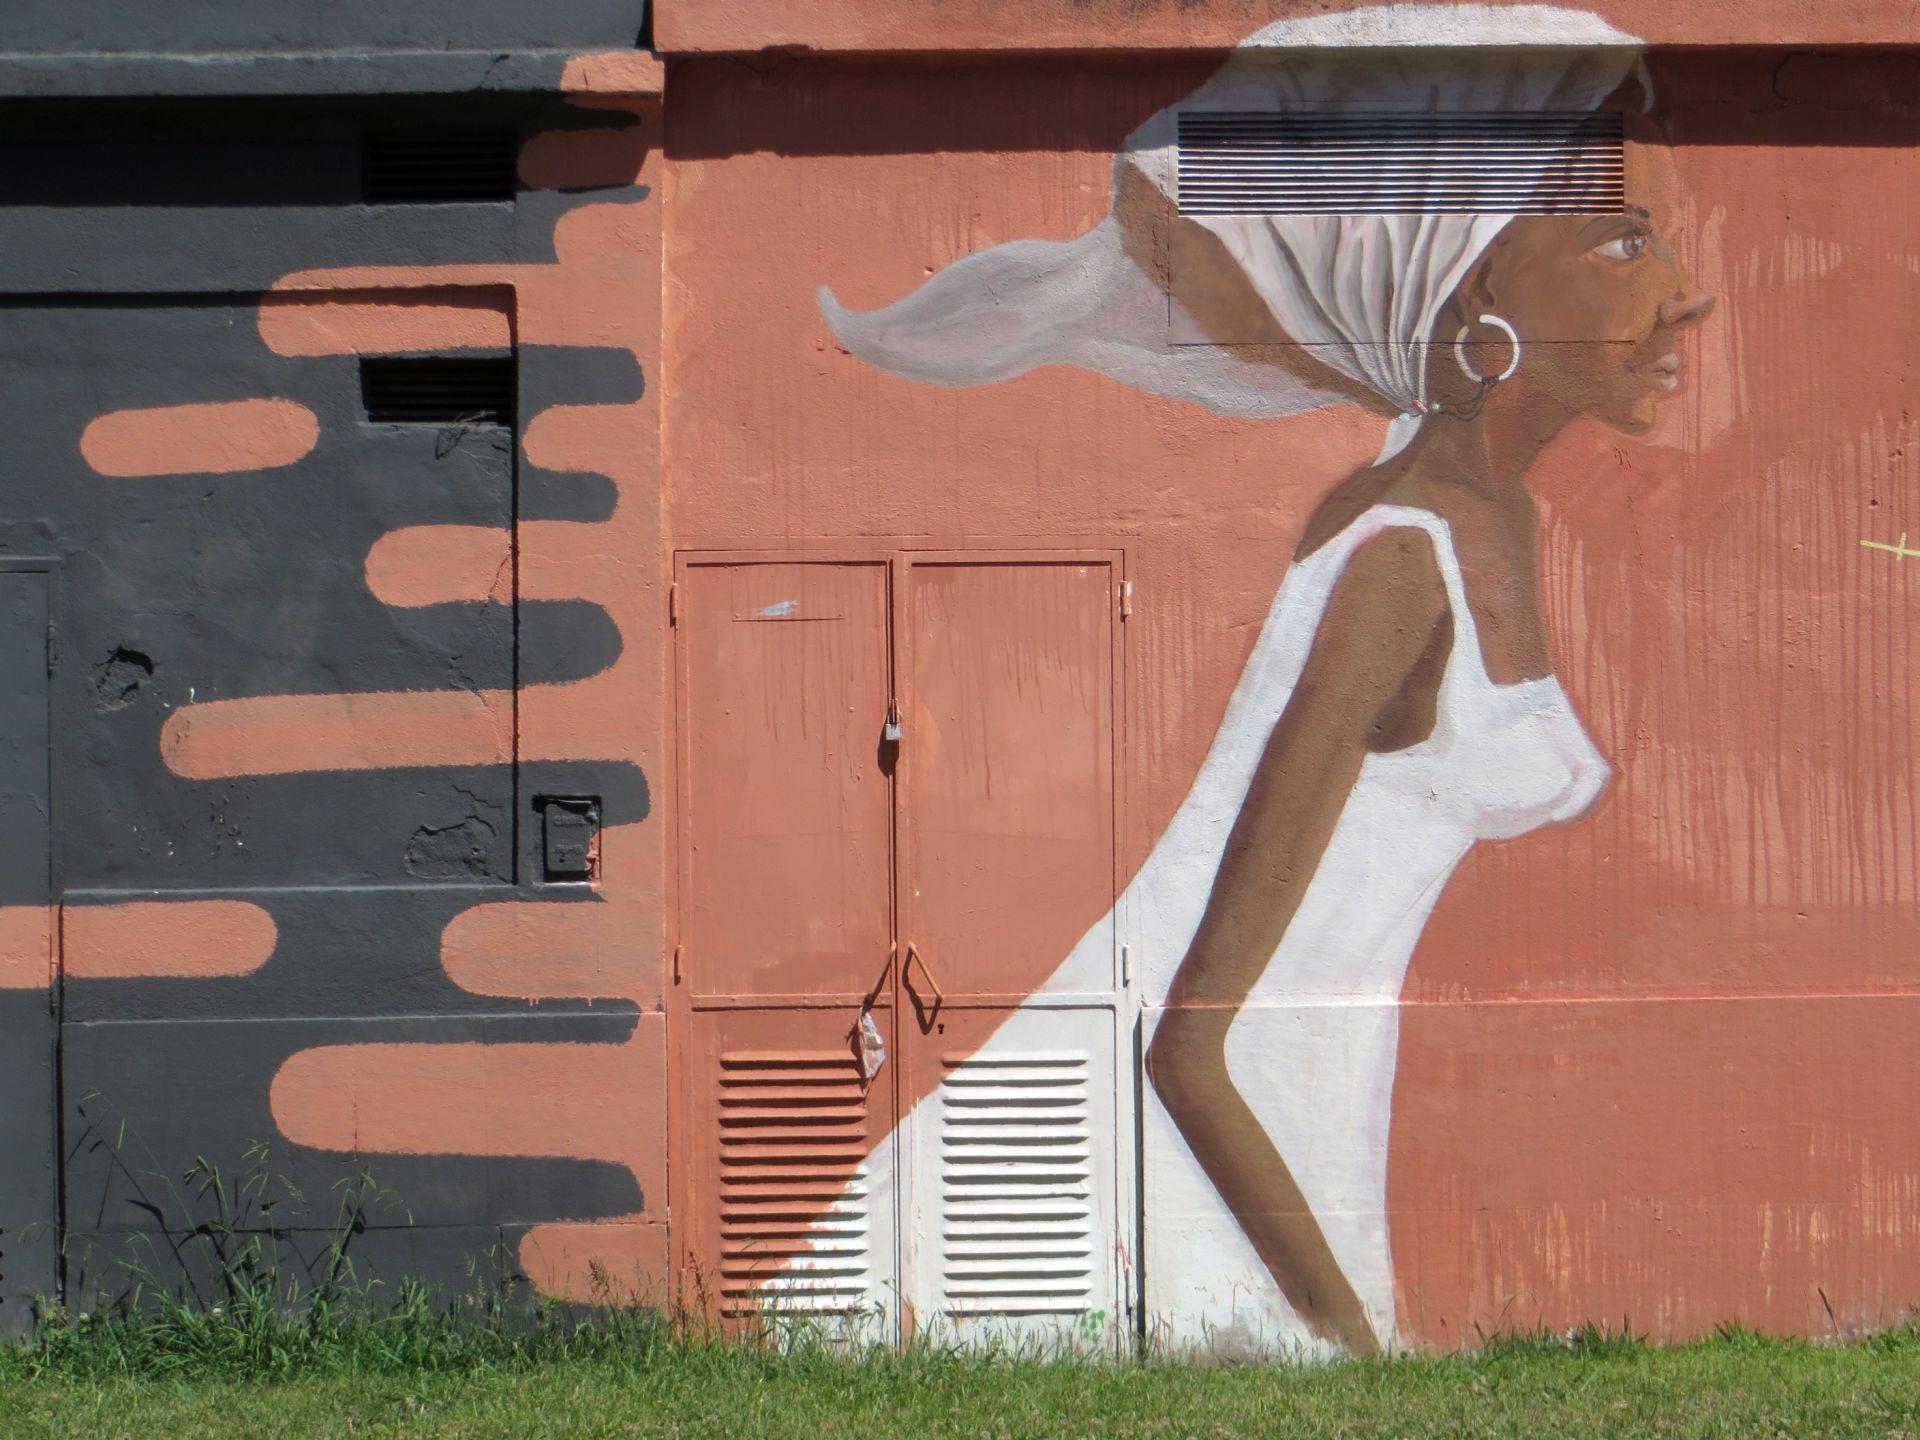 Graffiti art on wood - Wood Woman Wall Color Graffiti Painting White Dress Street Art Sculpture Art Mural Lisbon Graffiti Wall